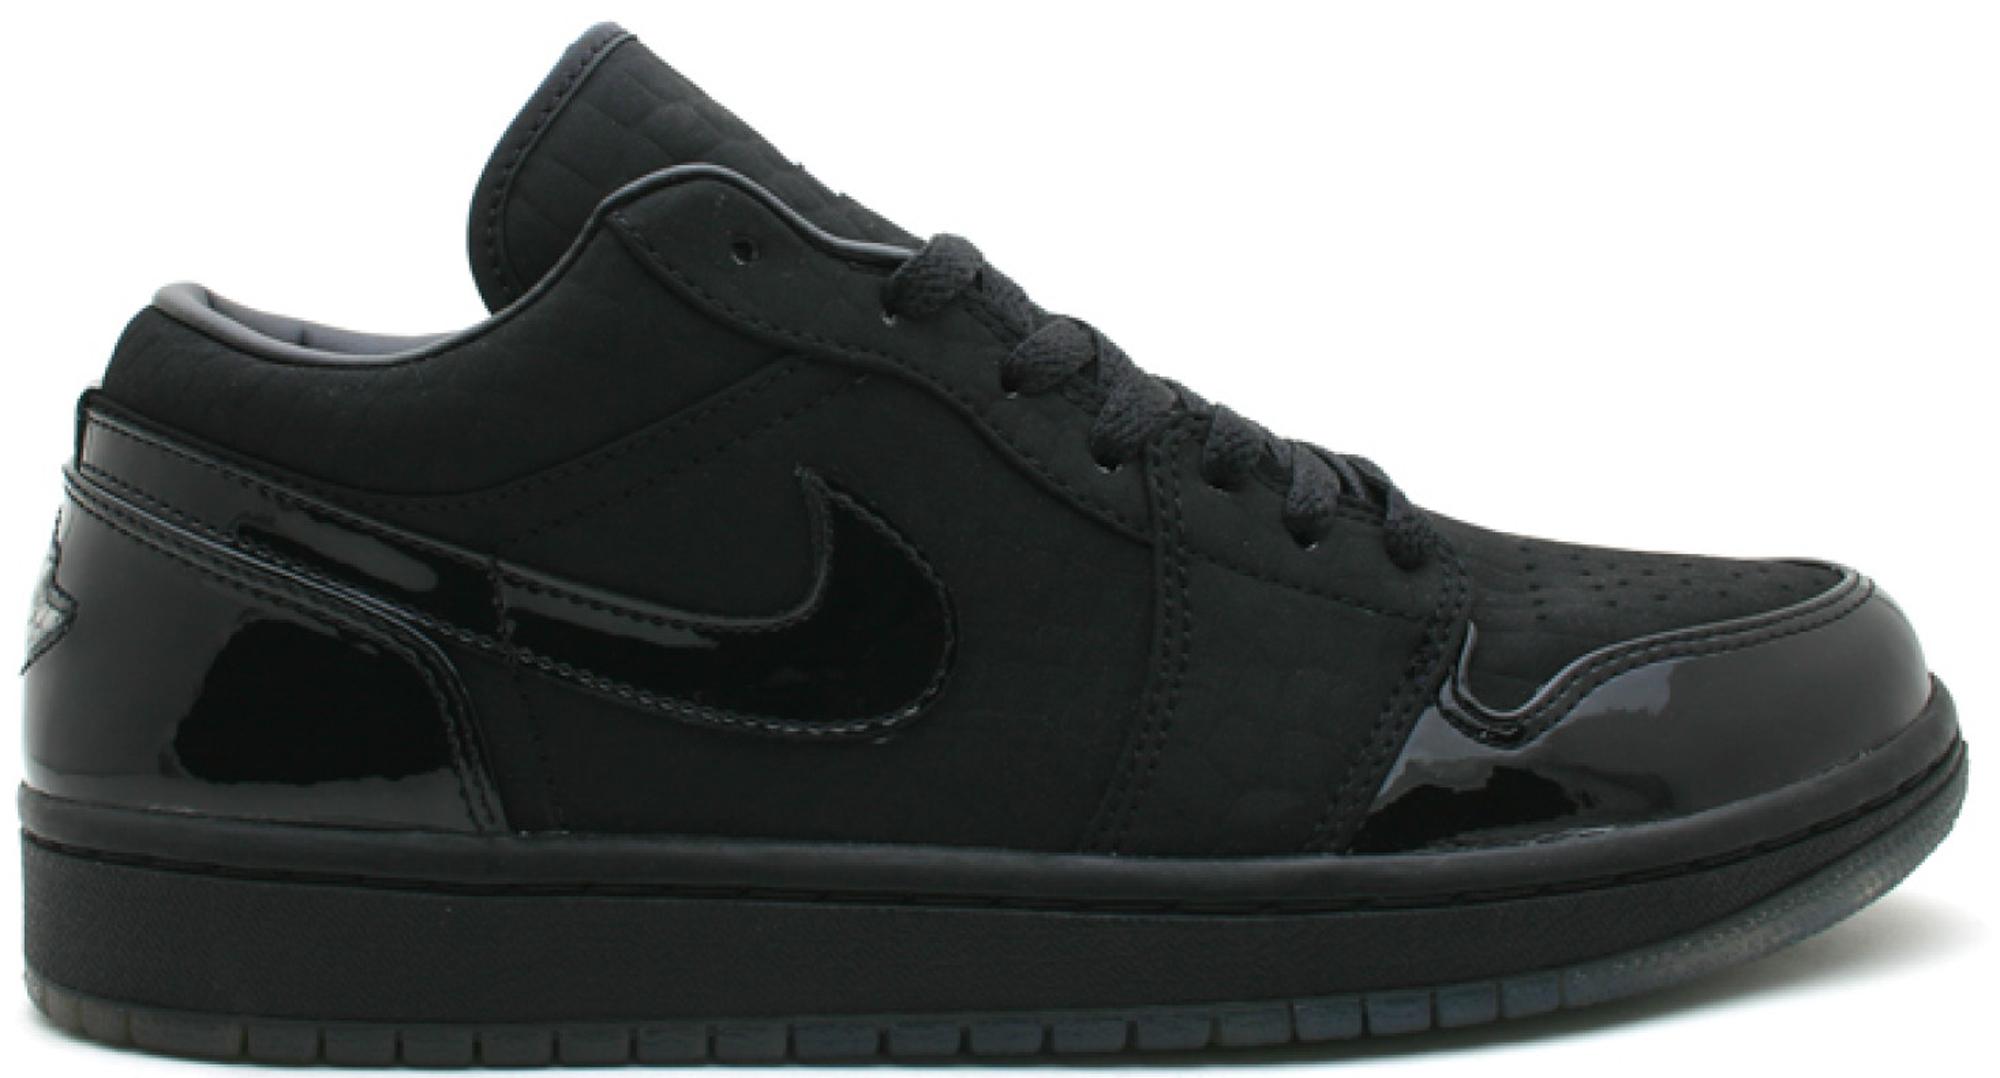 Jordan 1 Retro Low Black Croc